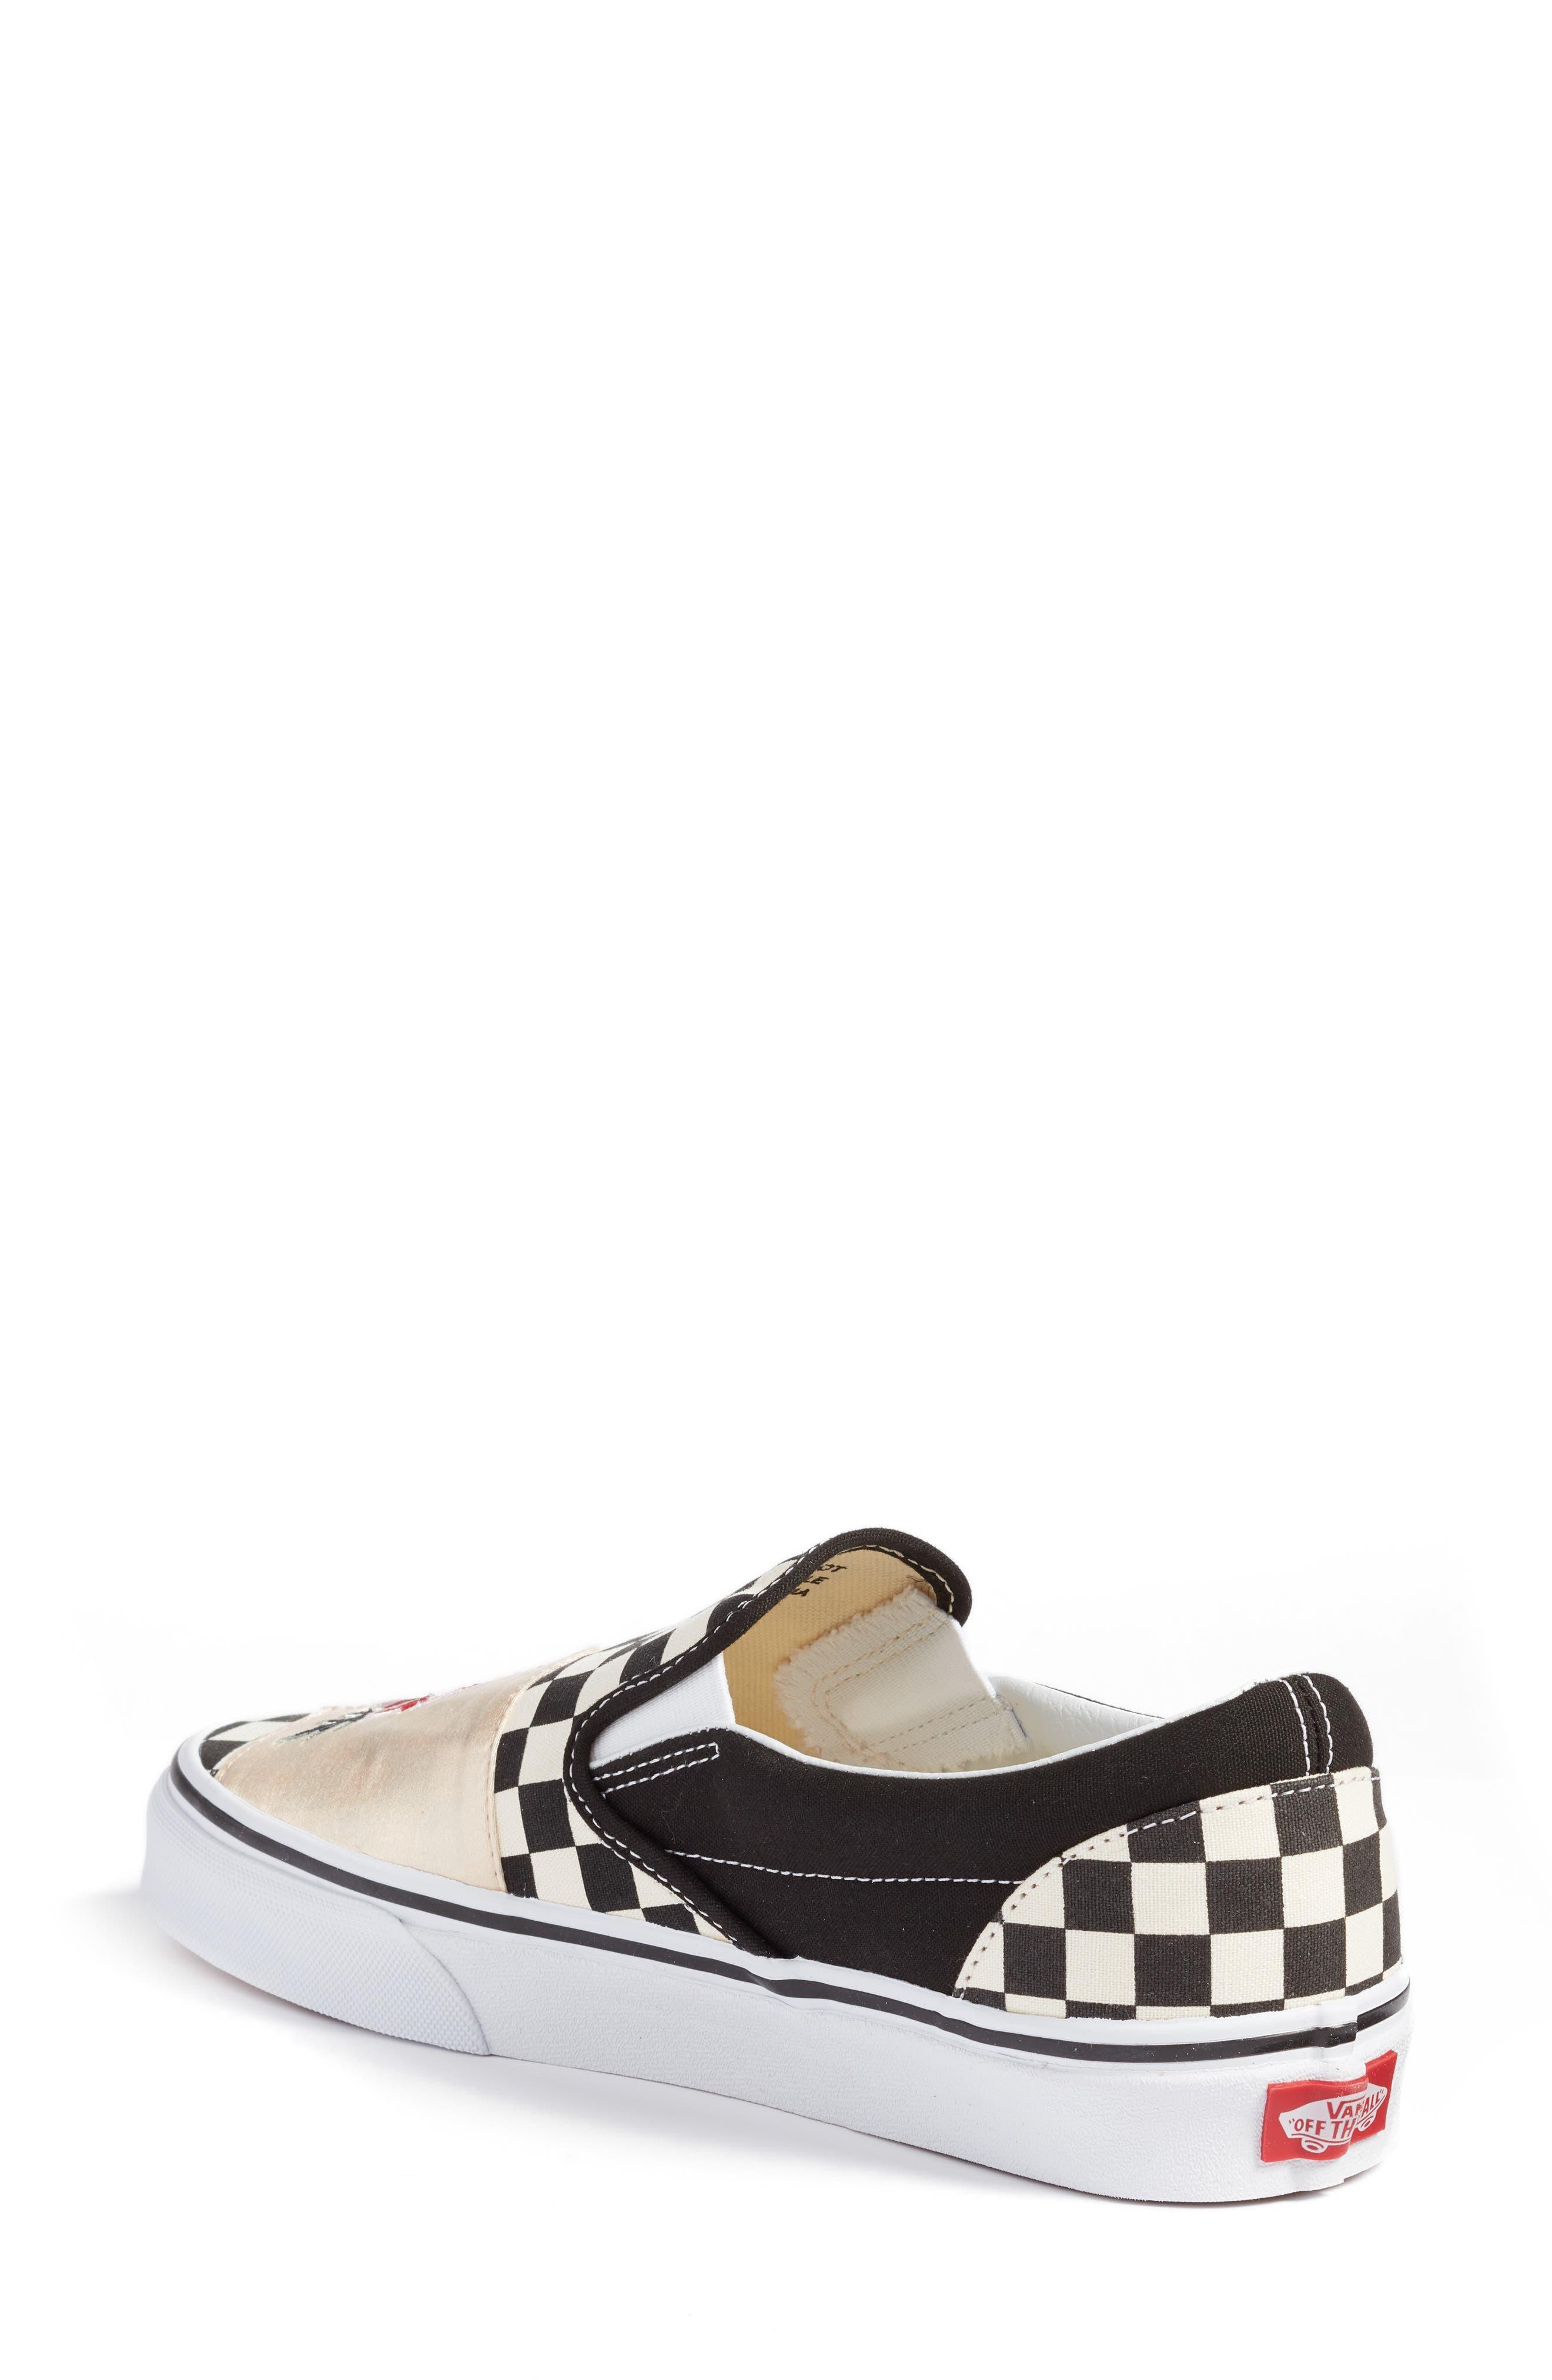 UA Classic Slip-On Sneaker,                             Alternate thumbnail 2, color,                             001